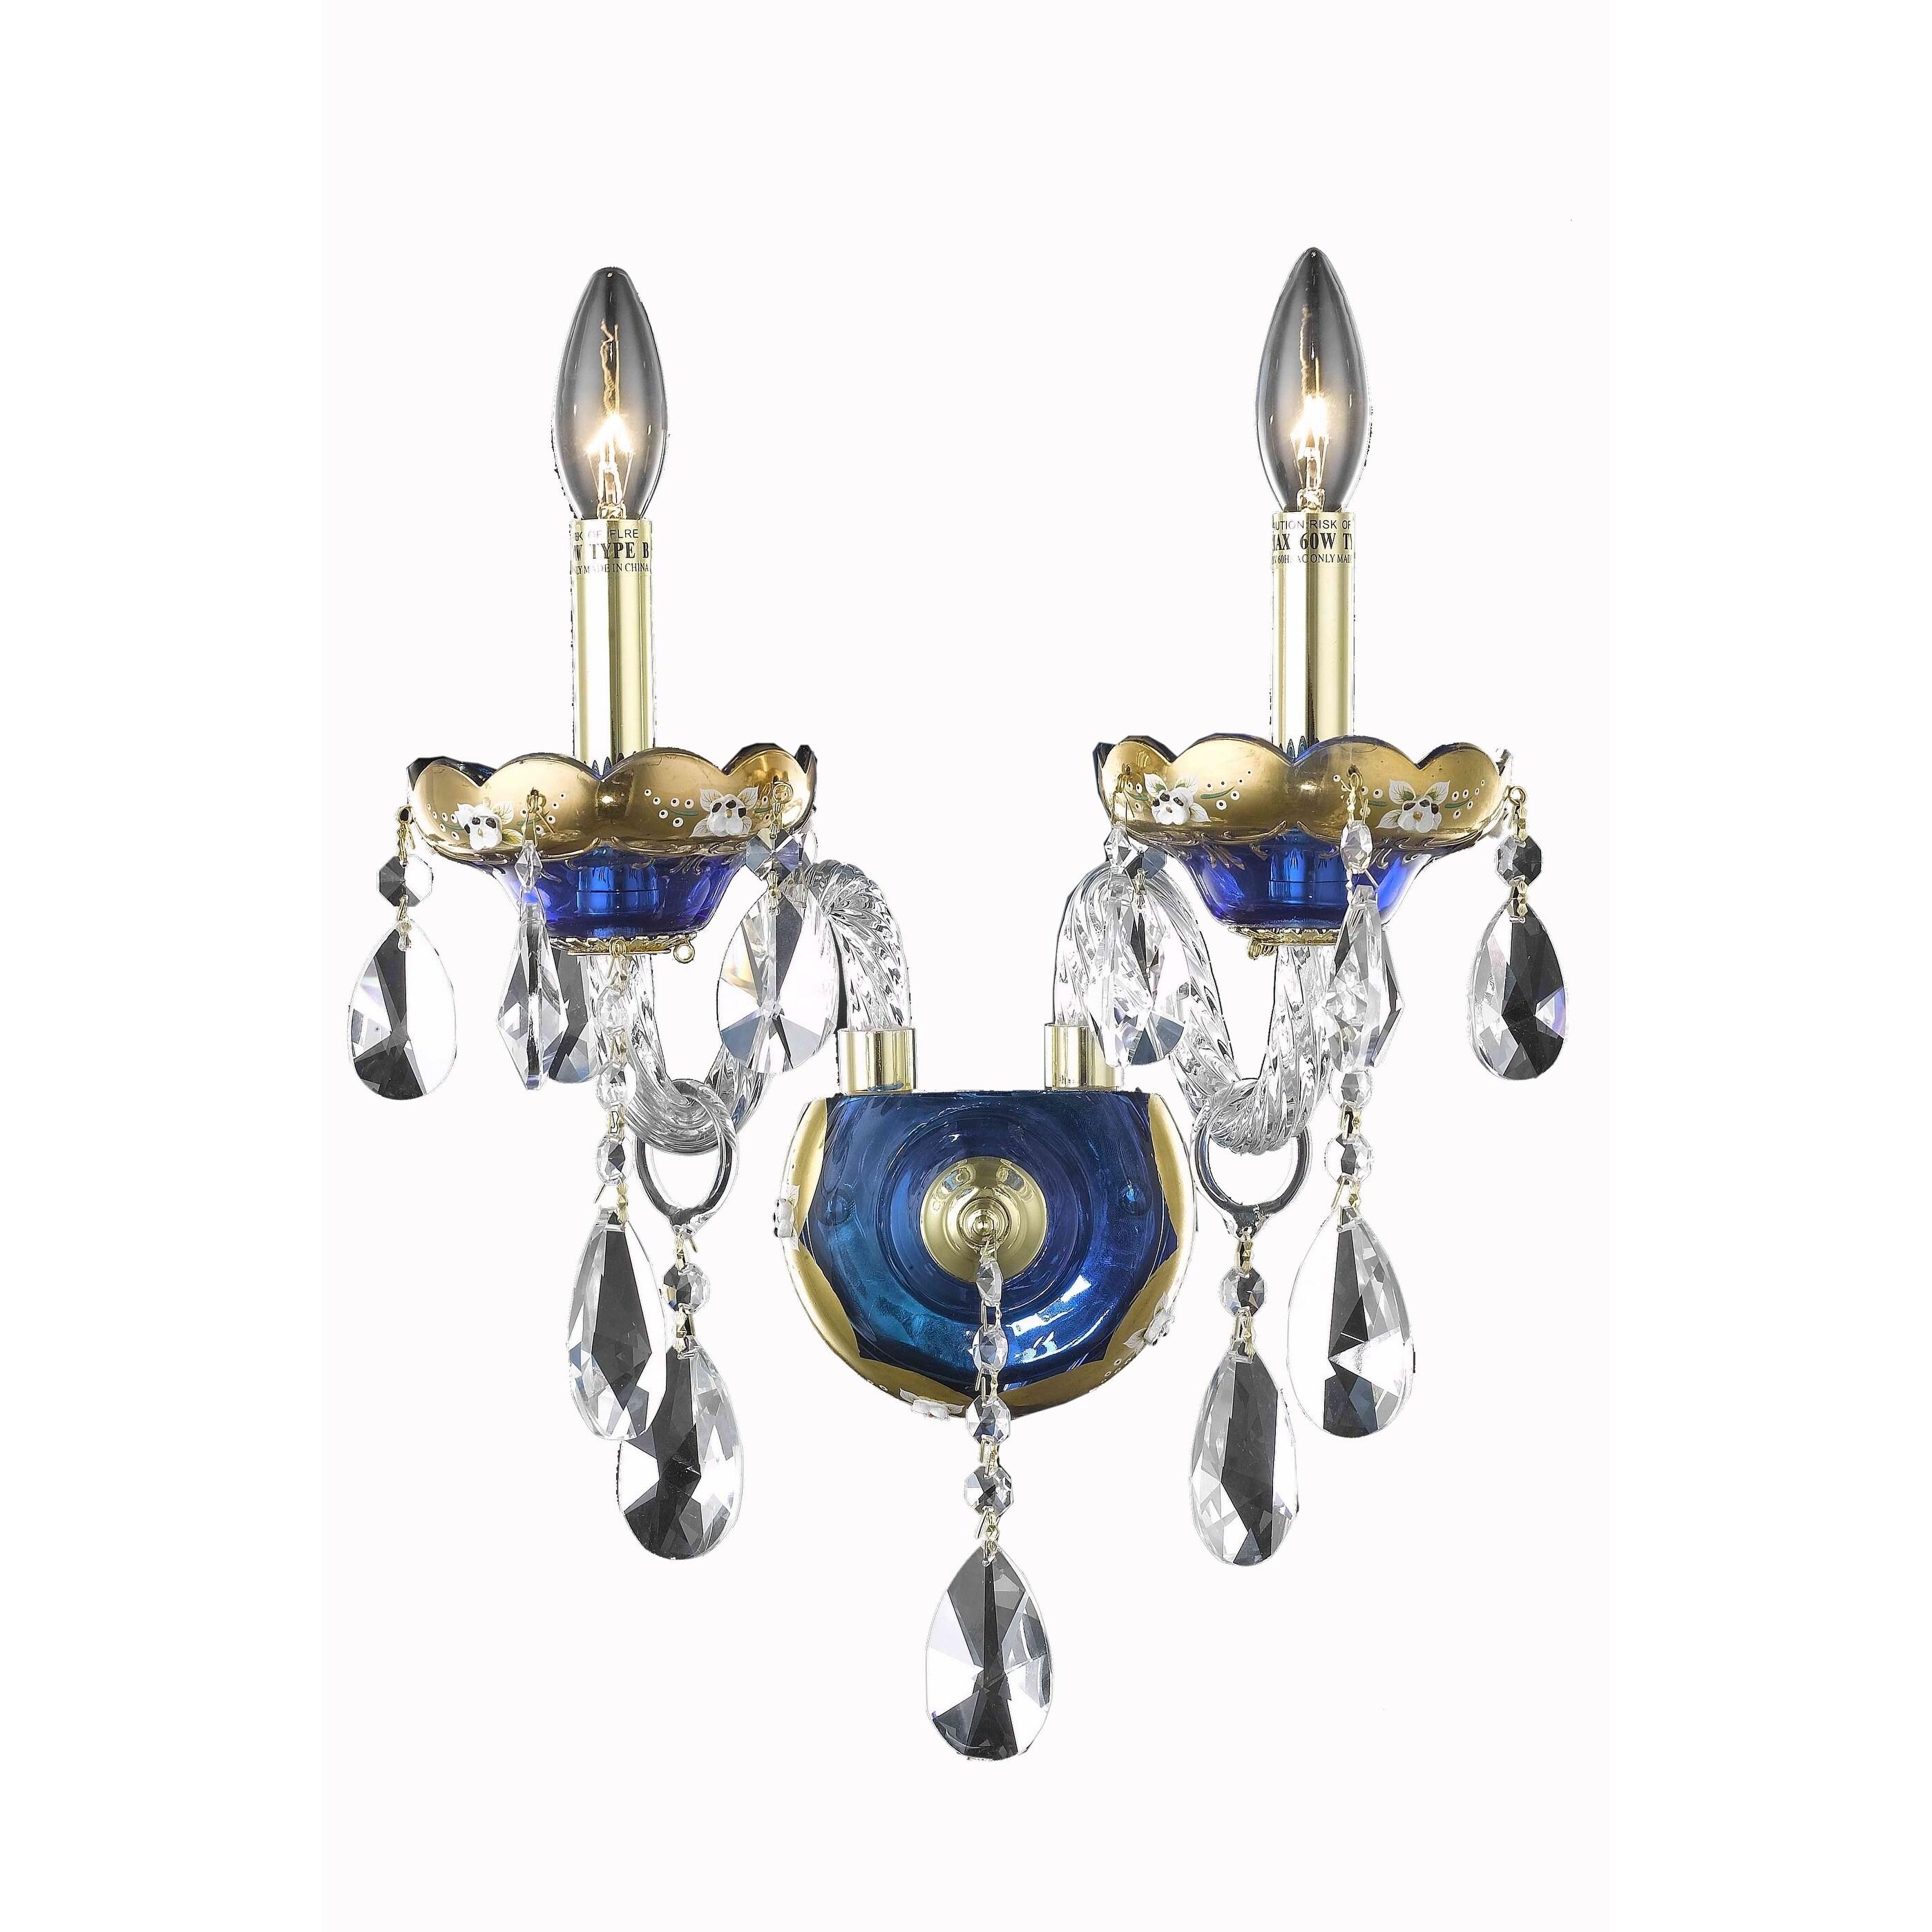 Shop Fleur Illumination 2 Light Blue Wall Sconce Free Shipping